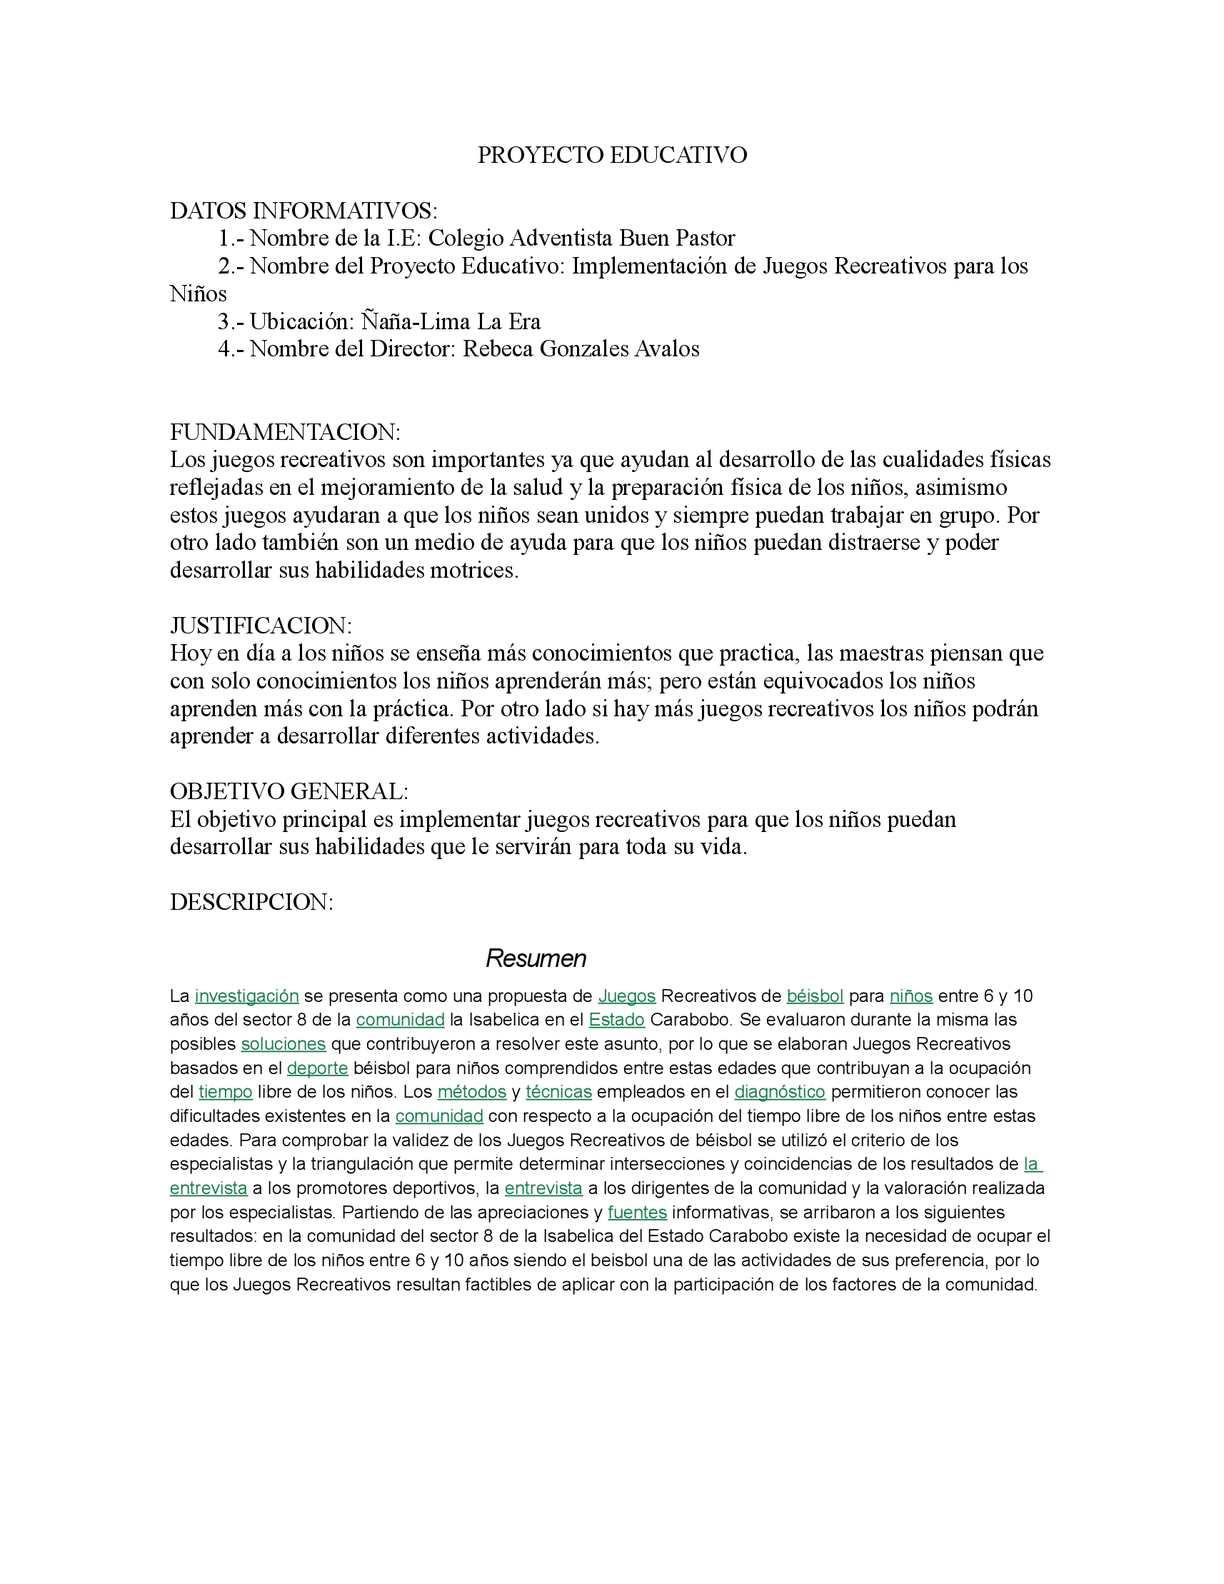 Calaméo - PROYECTO EDUCATIVO - IMPLEMENTACIÓN DE JUEGOS RECREATIVOS